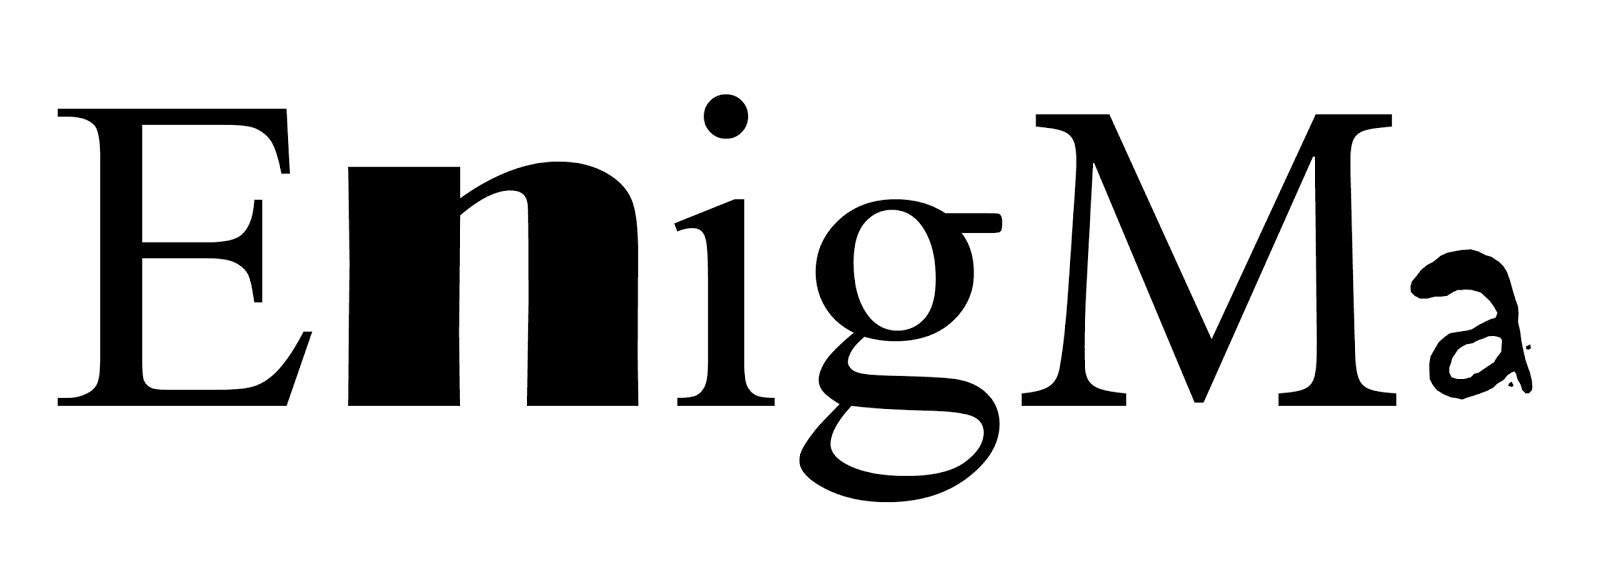 Enigma Weekend Edition Poem: